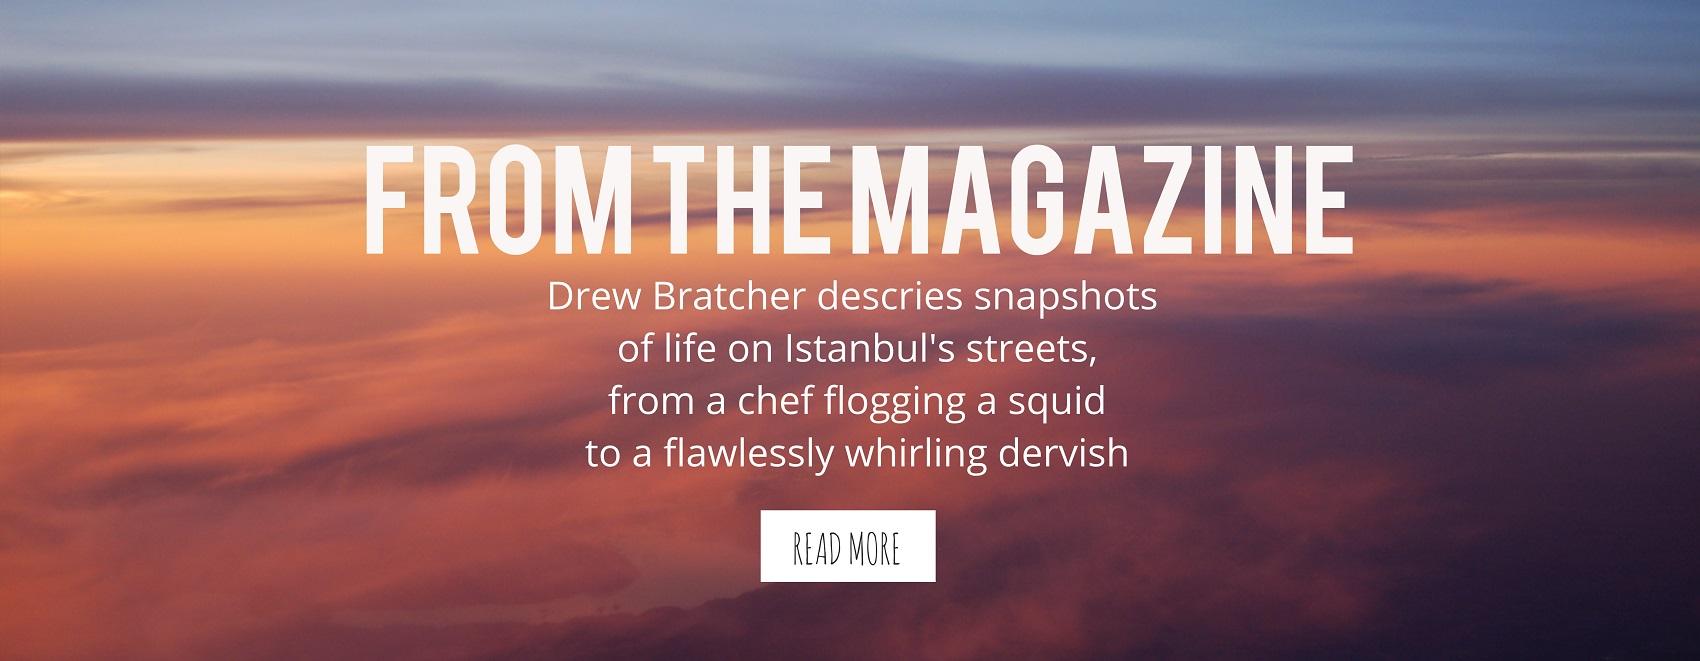 fromthemagazine-readmore3